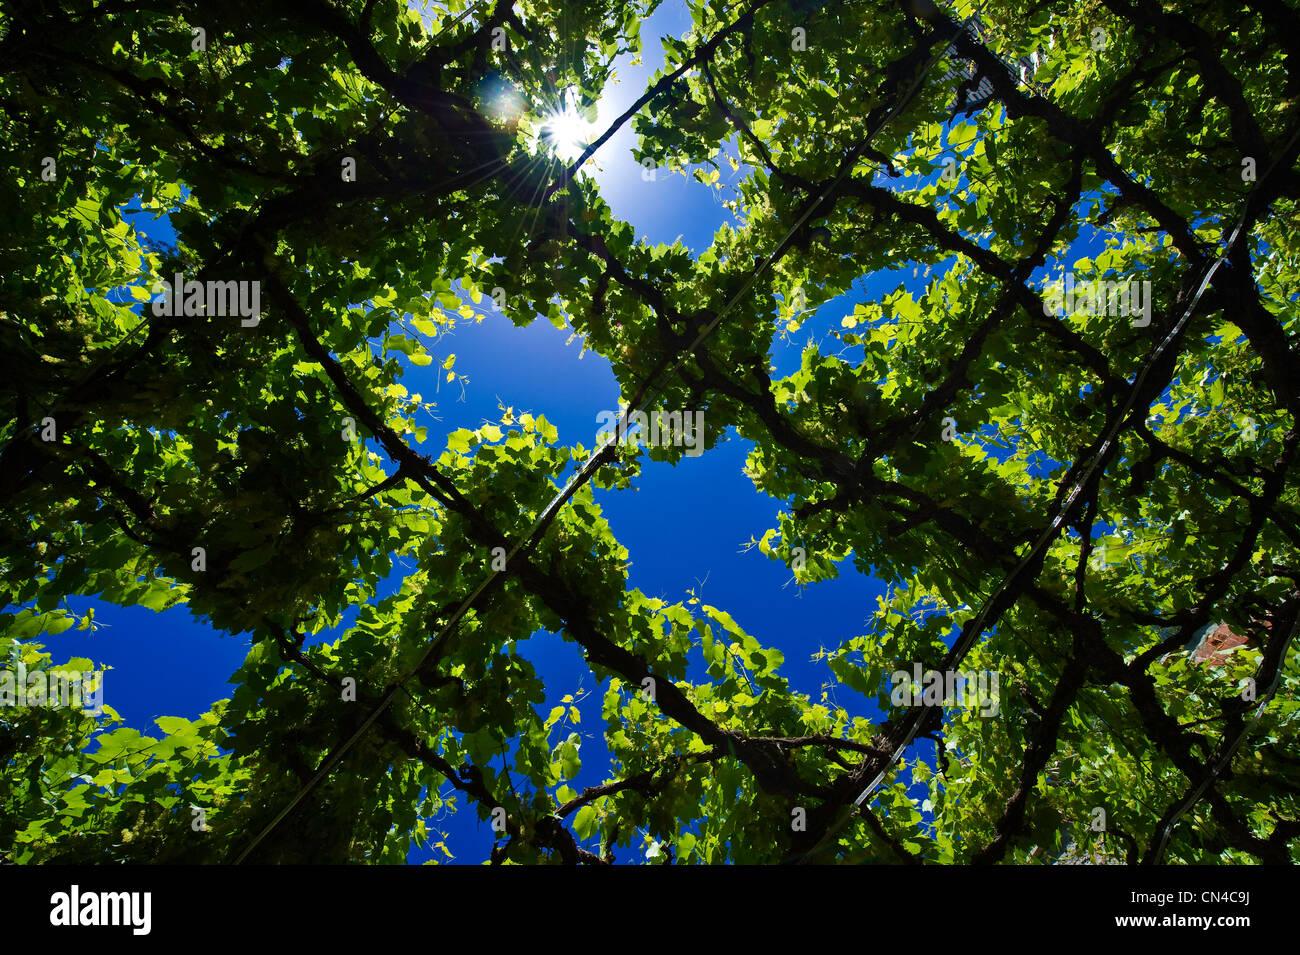 Australia, South Australia, Barrossa valley, vine leaves - Stock Image